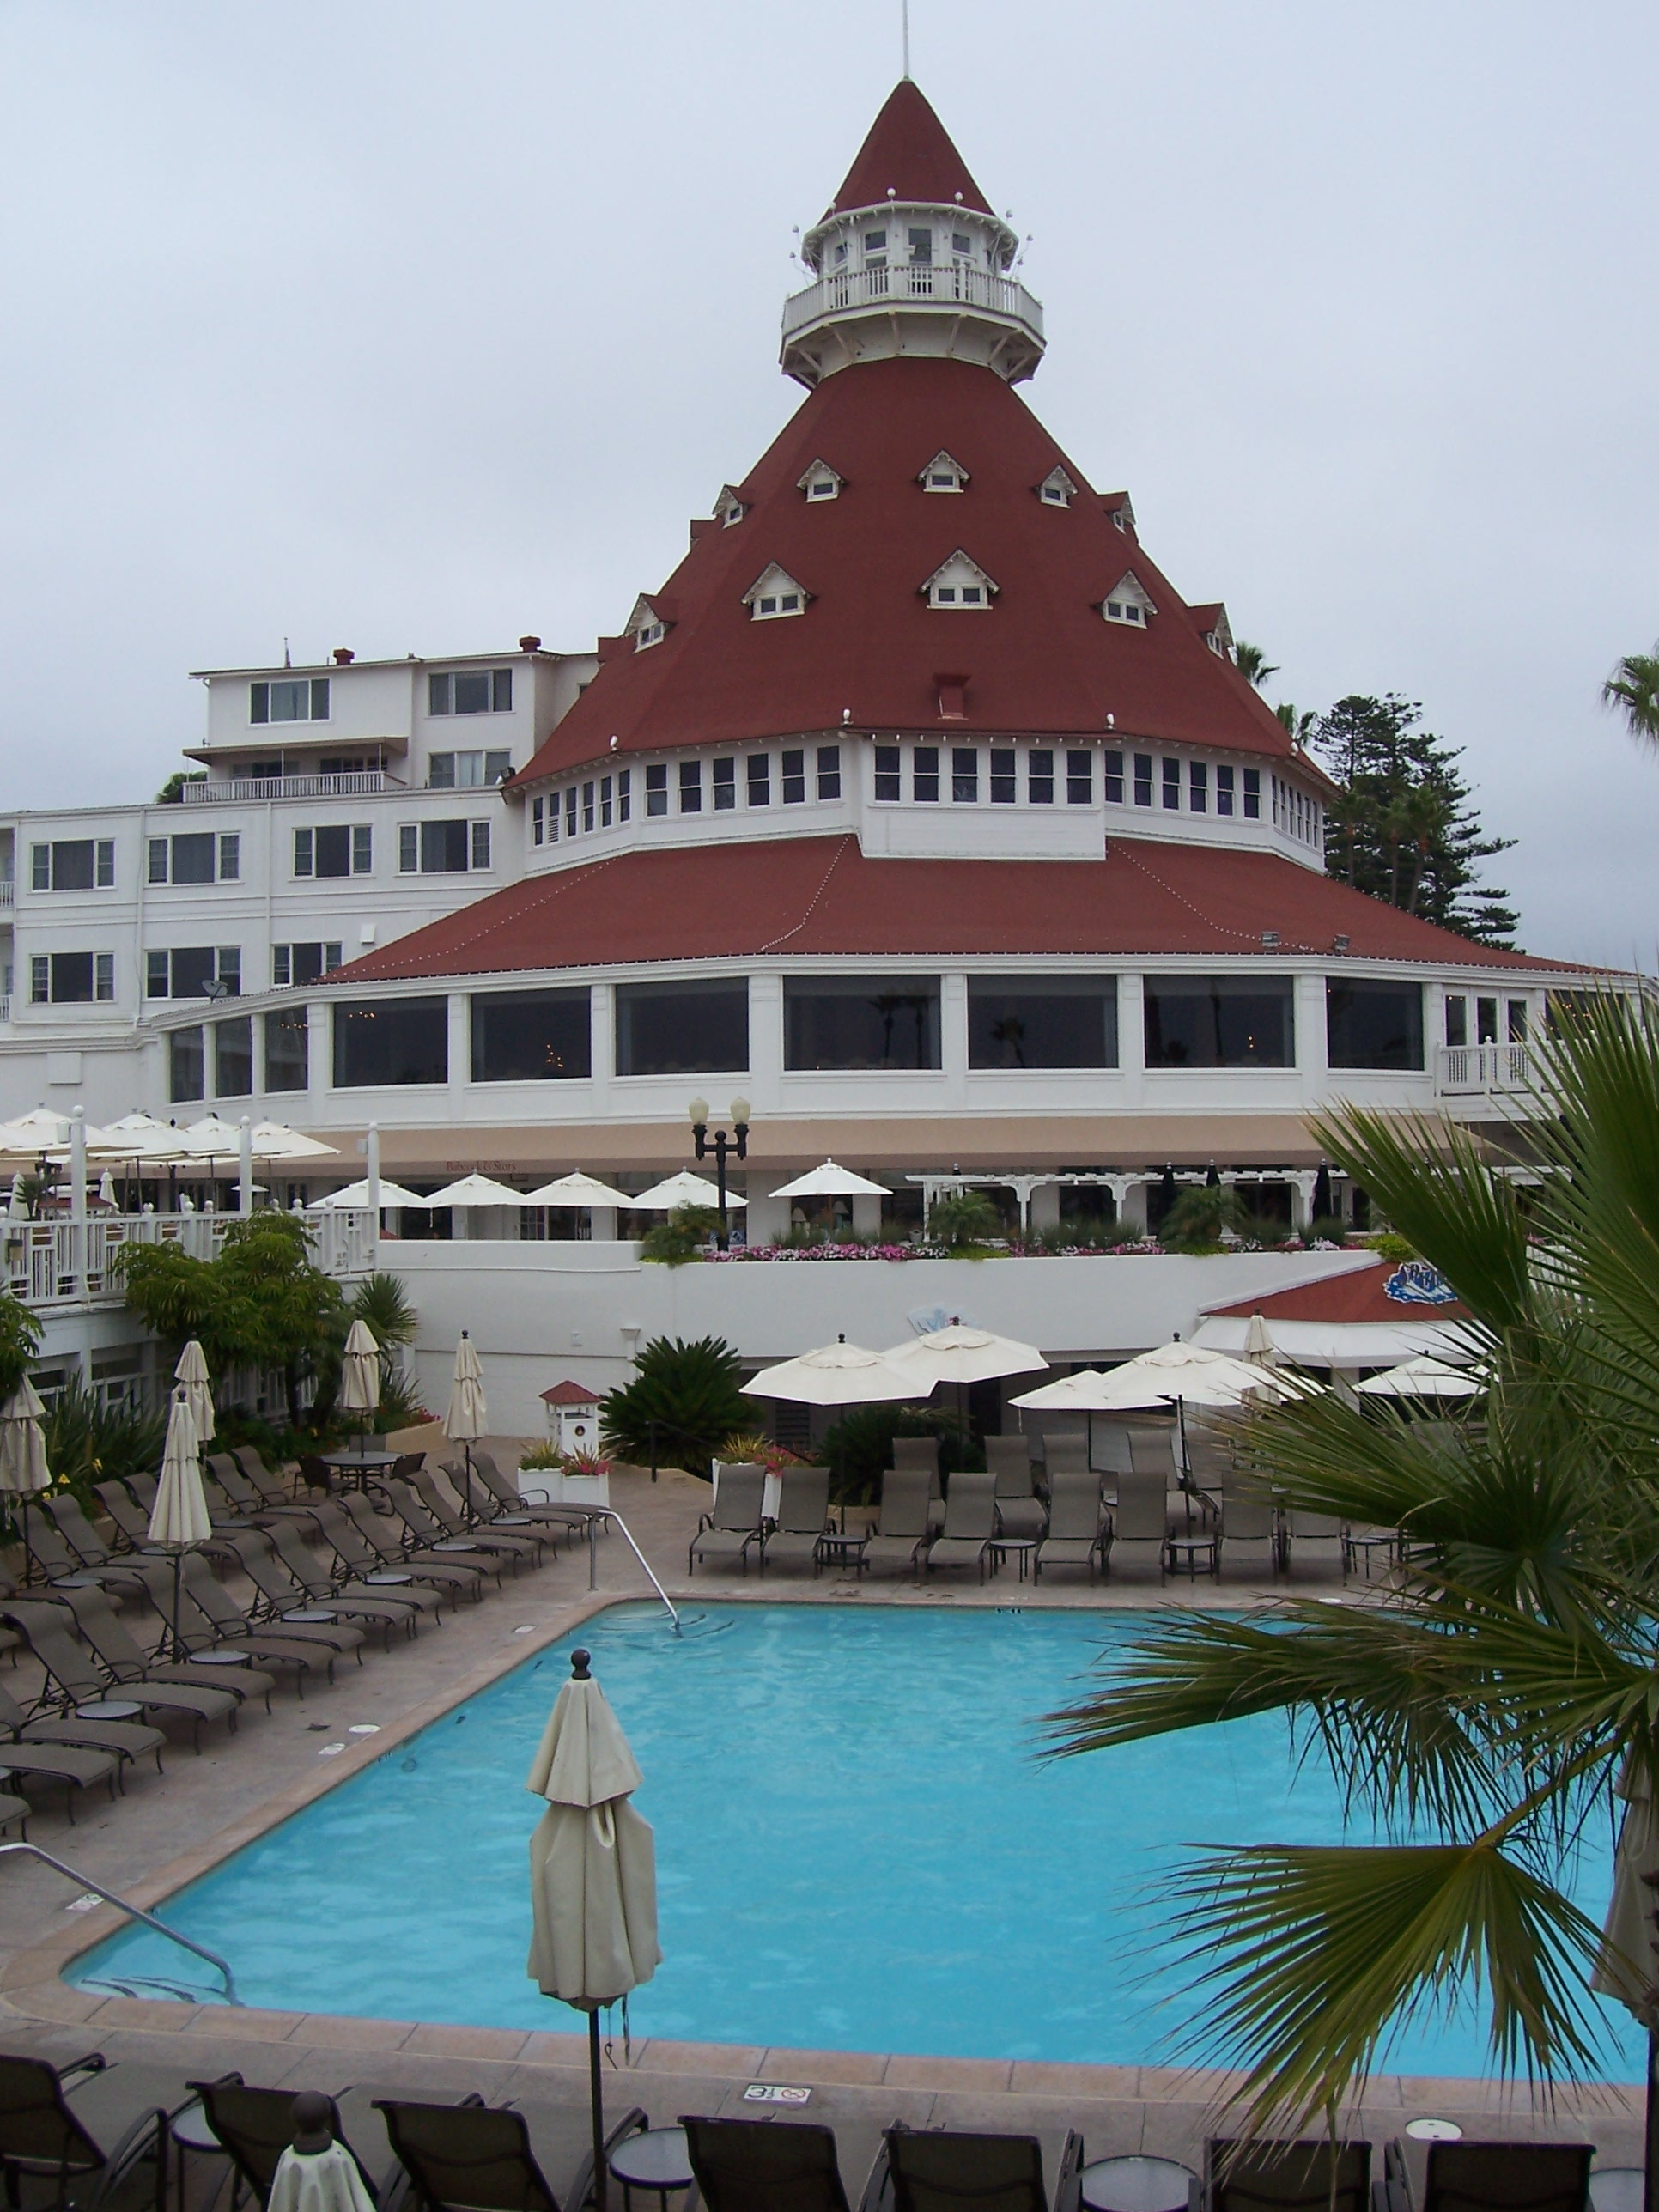 Hotel Del Coronado Coronado Ca: Hotel Del Coronado, San Diego, California